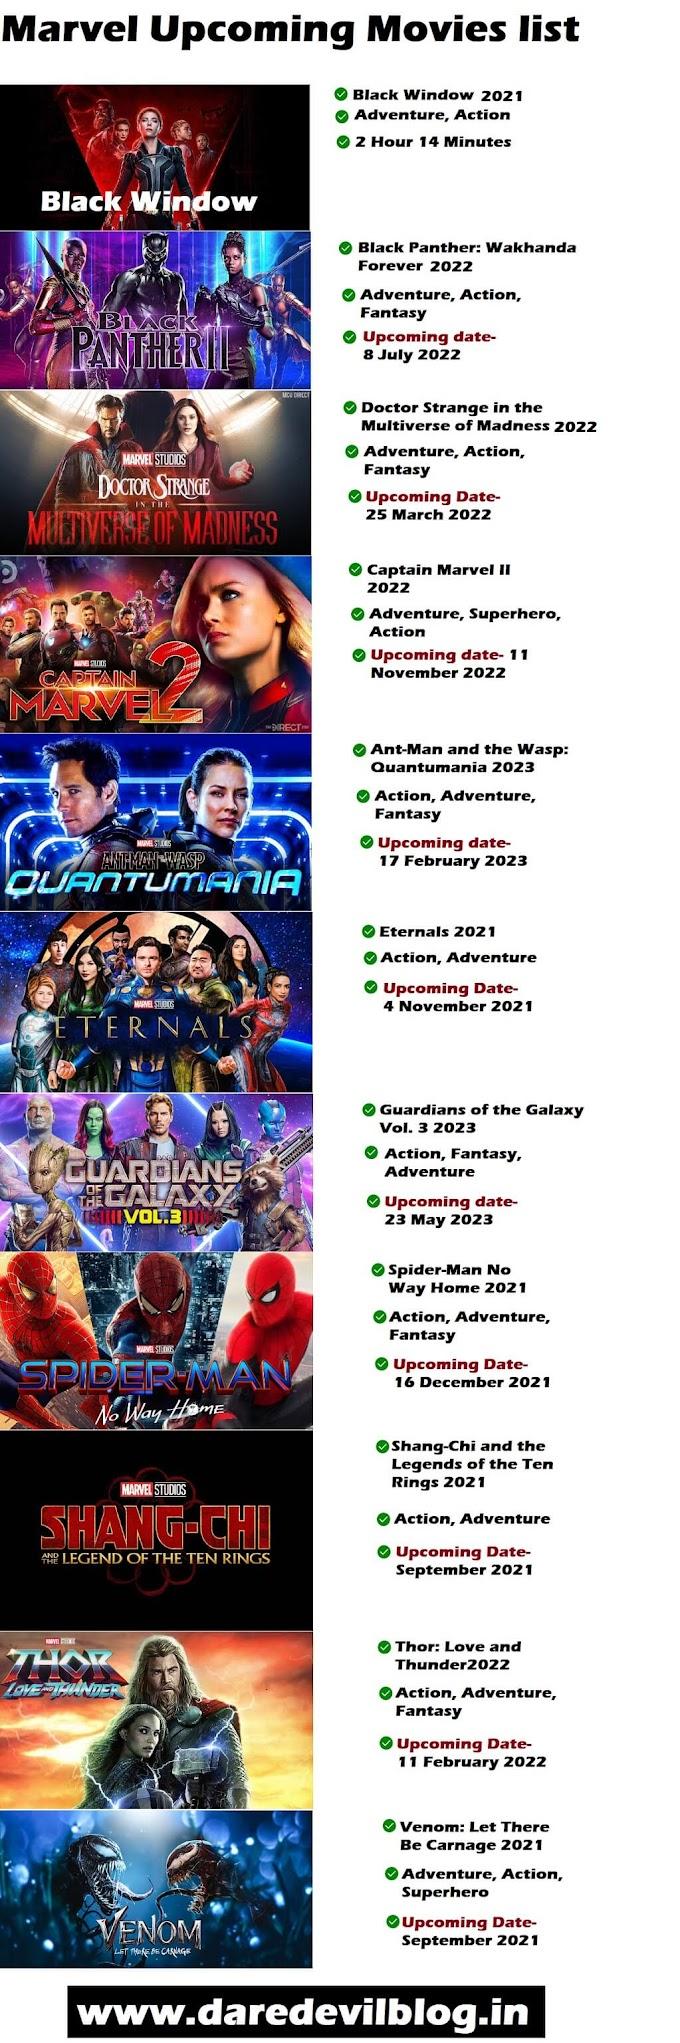 Marvel Upcoming Movies list 2021